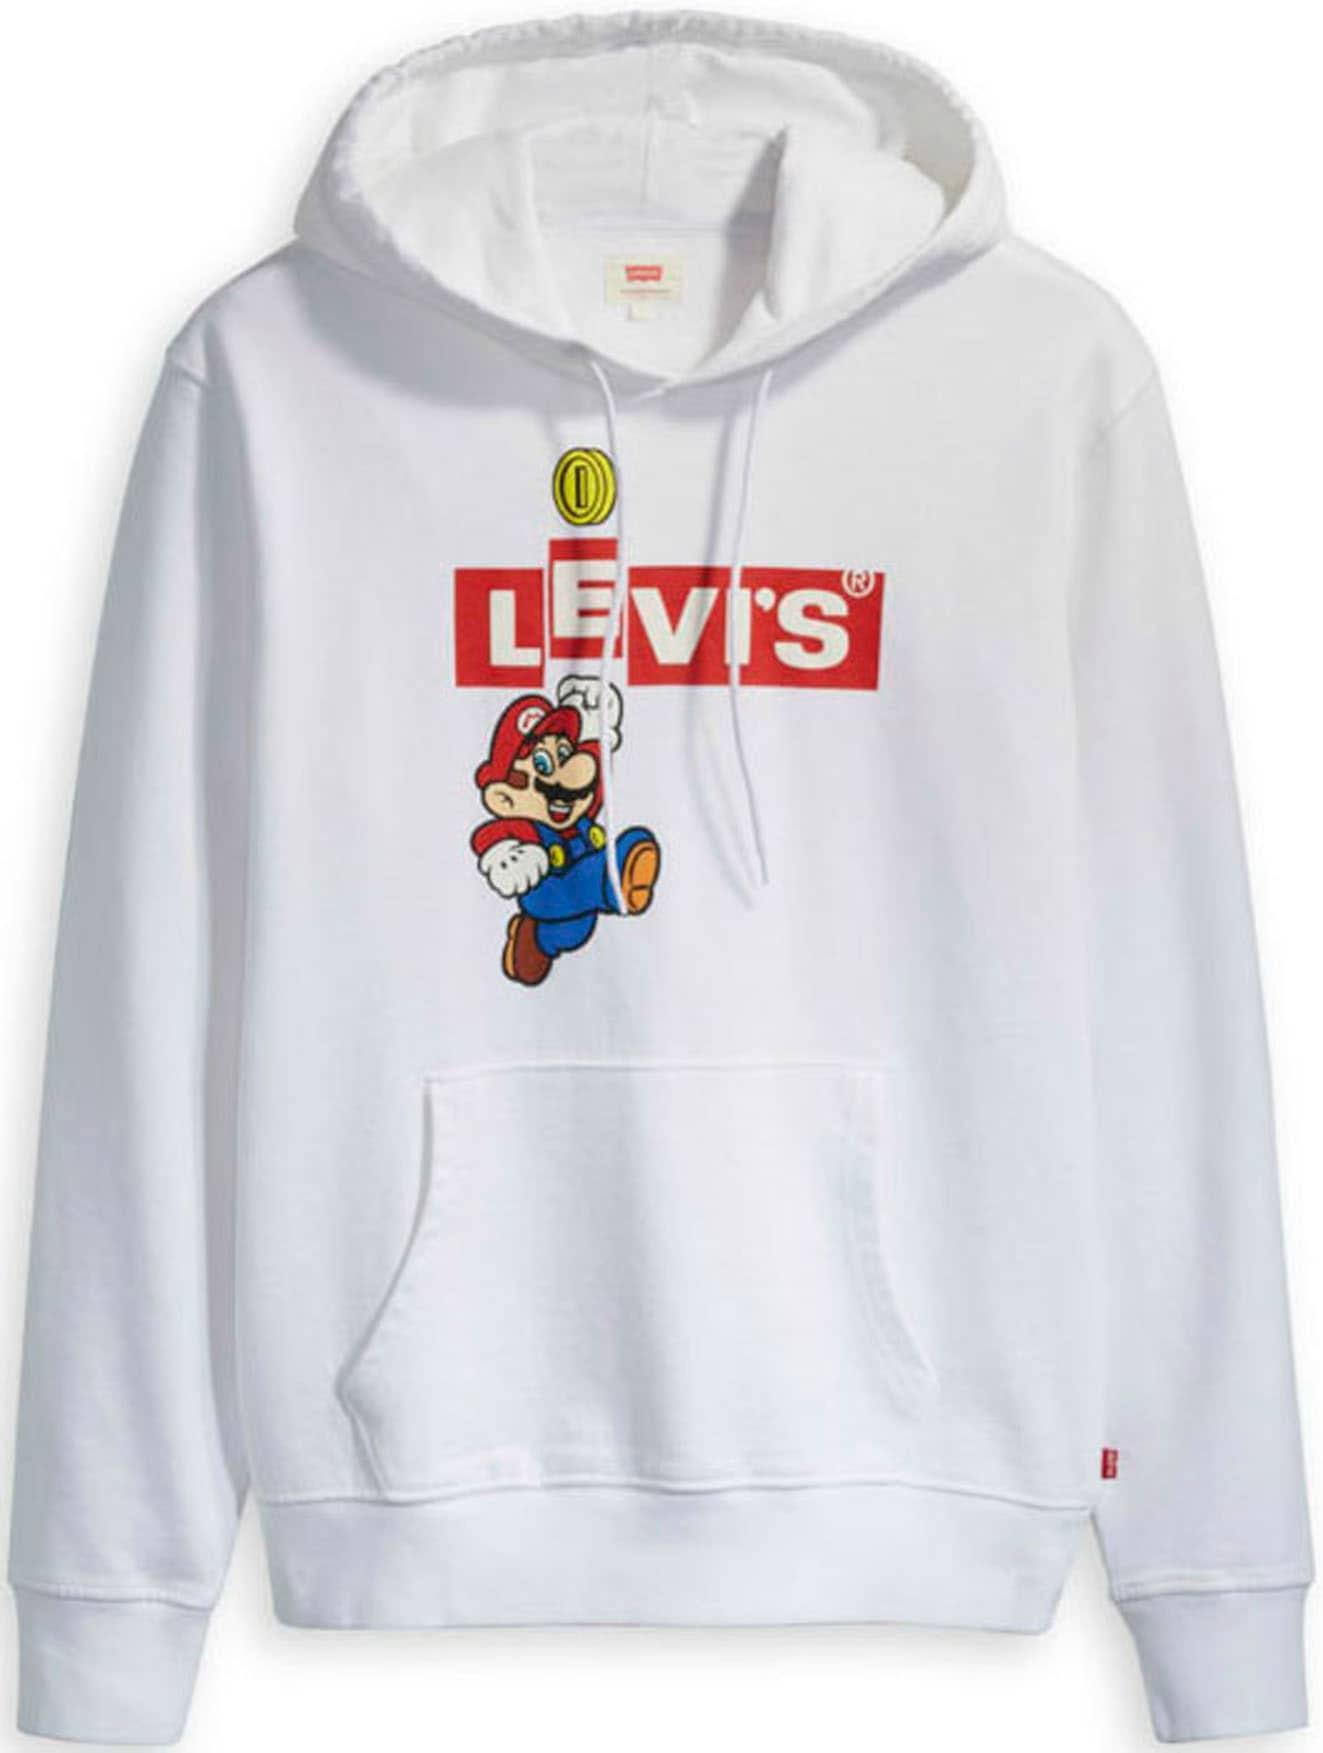 levi's -  Hoodie Nintendo x